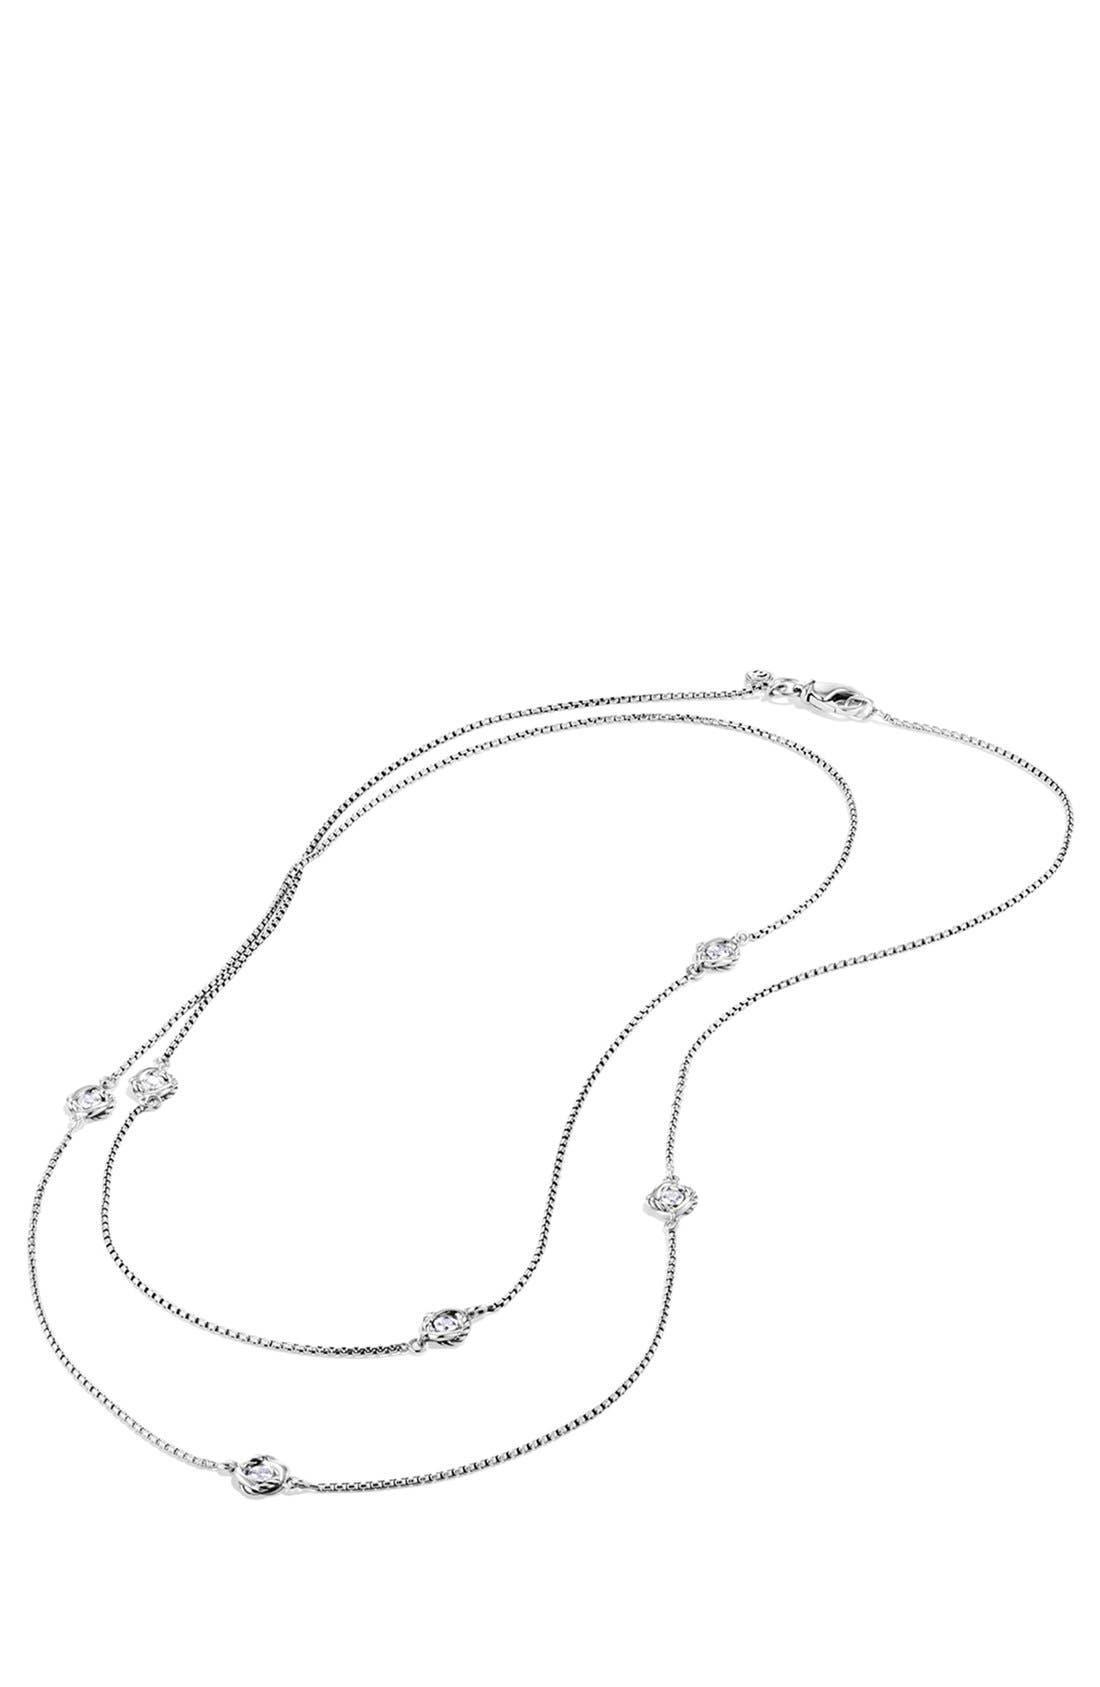 Alternate Image 2  - David Yurman 'Infinity' Necklace with Diamonds